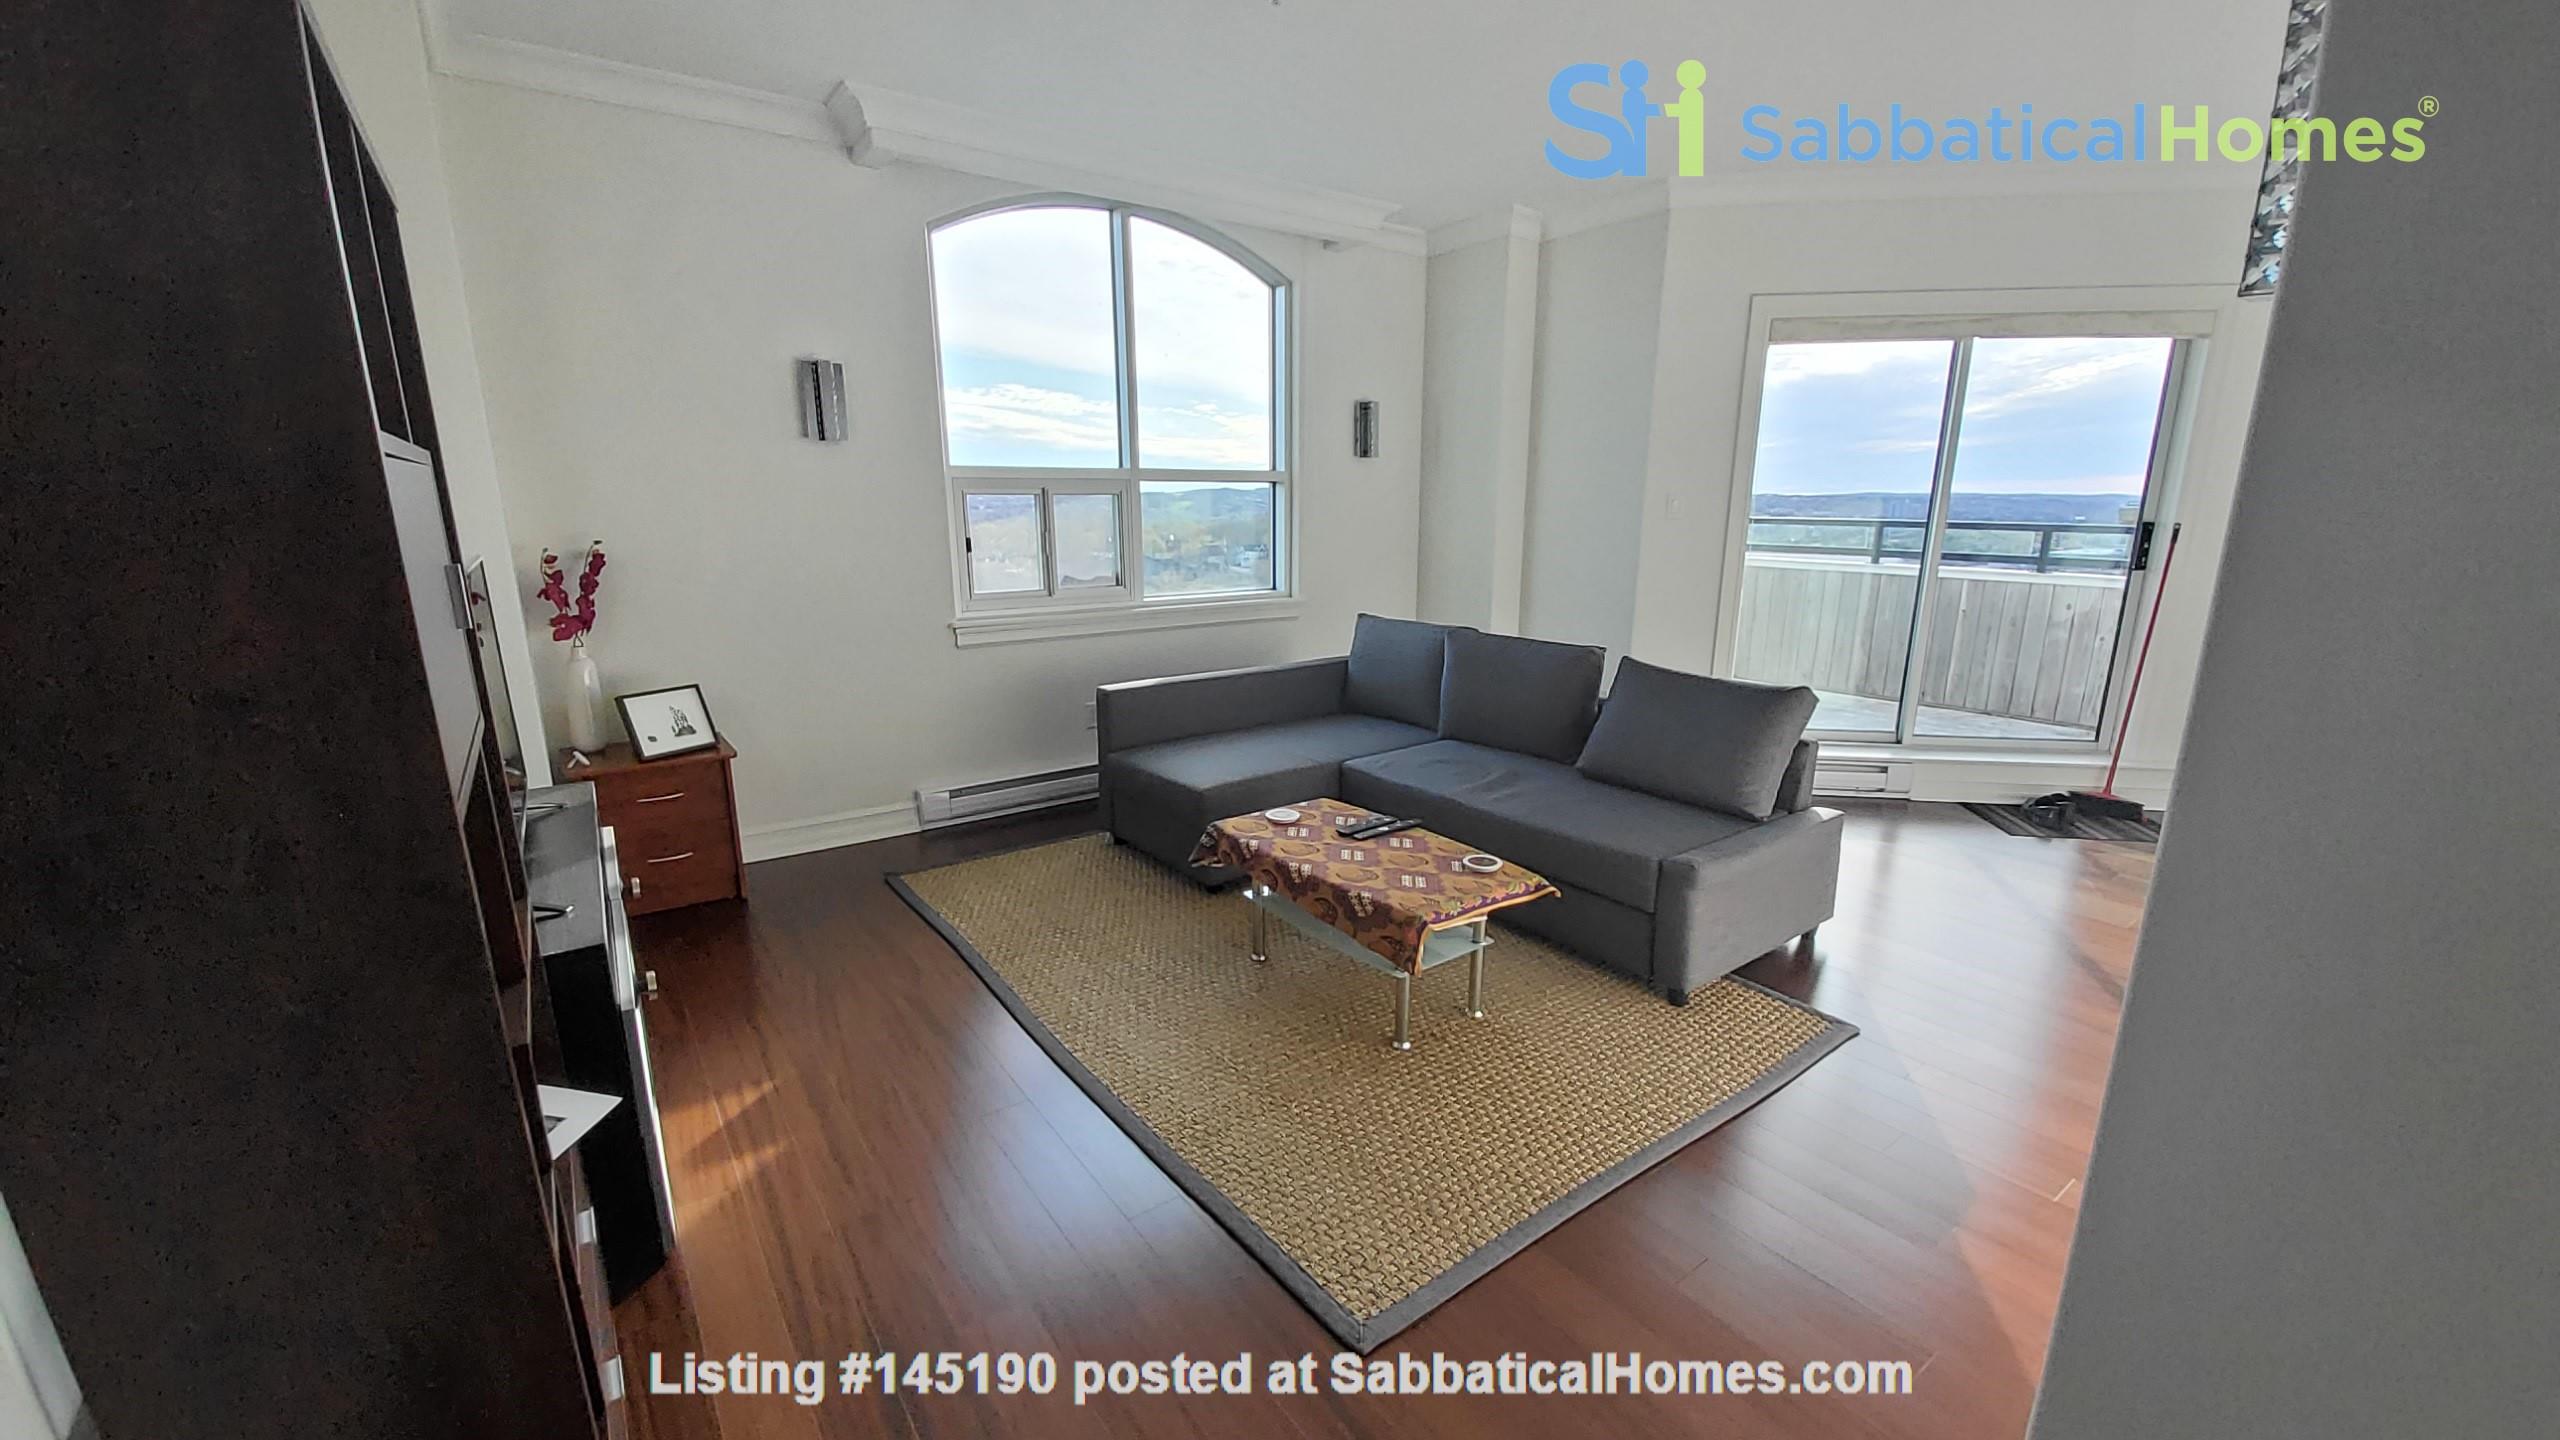 Spacious, Sunny, 12th-floor Condo in the North End of Halifax, Nova Scotia Home Rental in Halifax, Nova Scotia, Canada 0